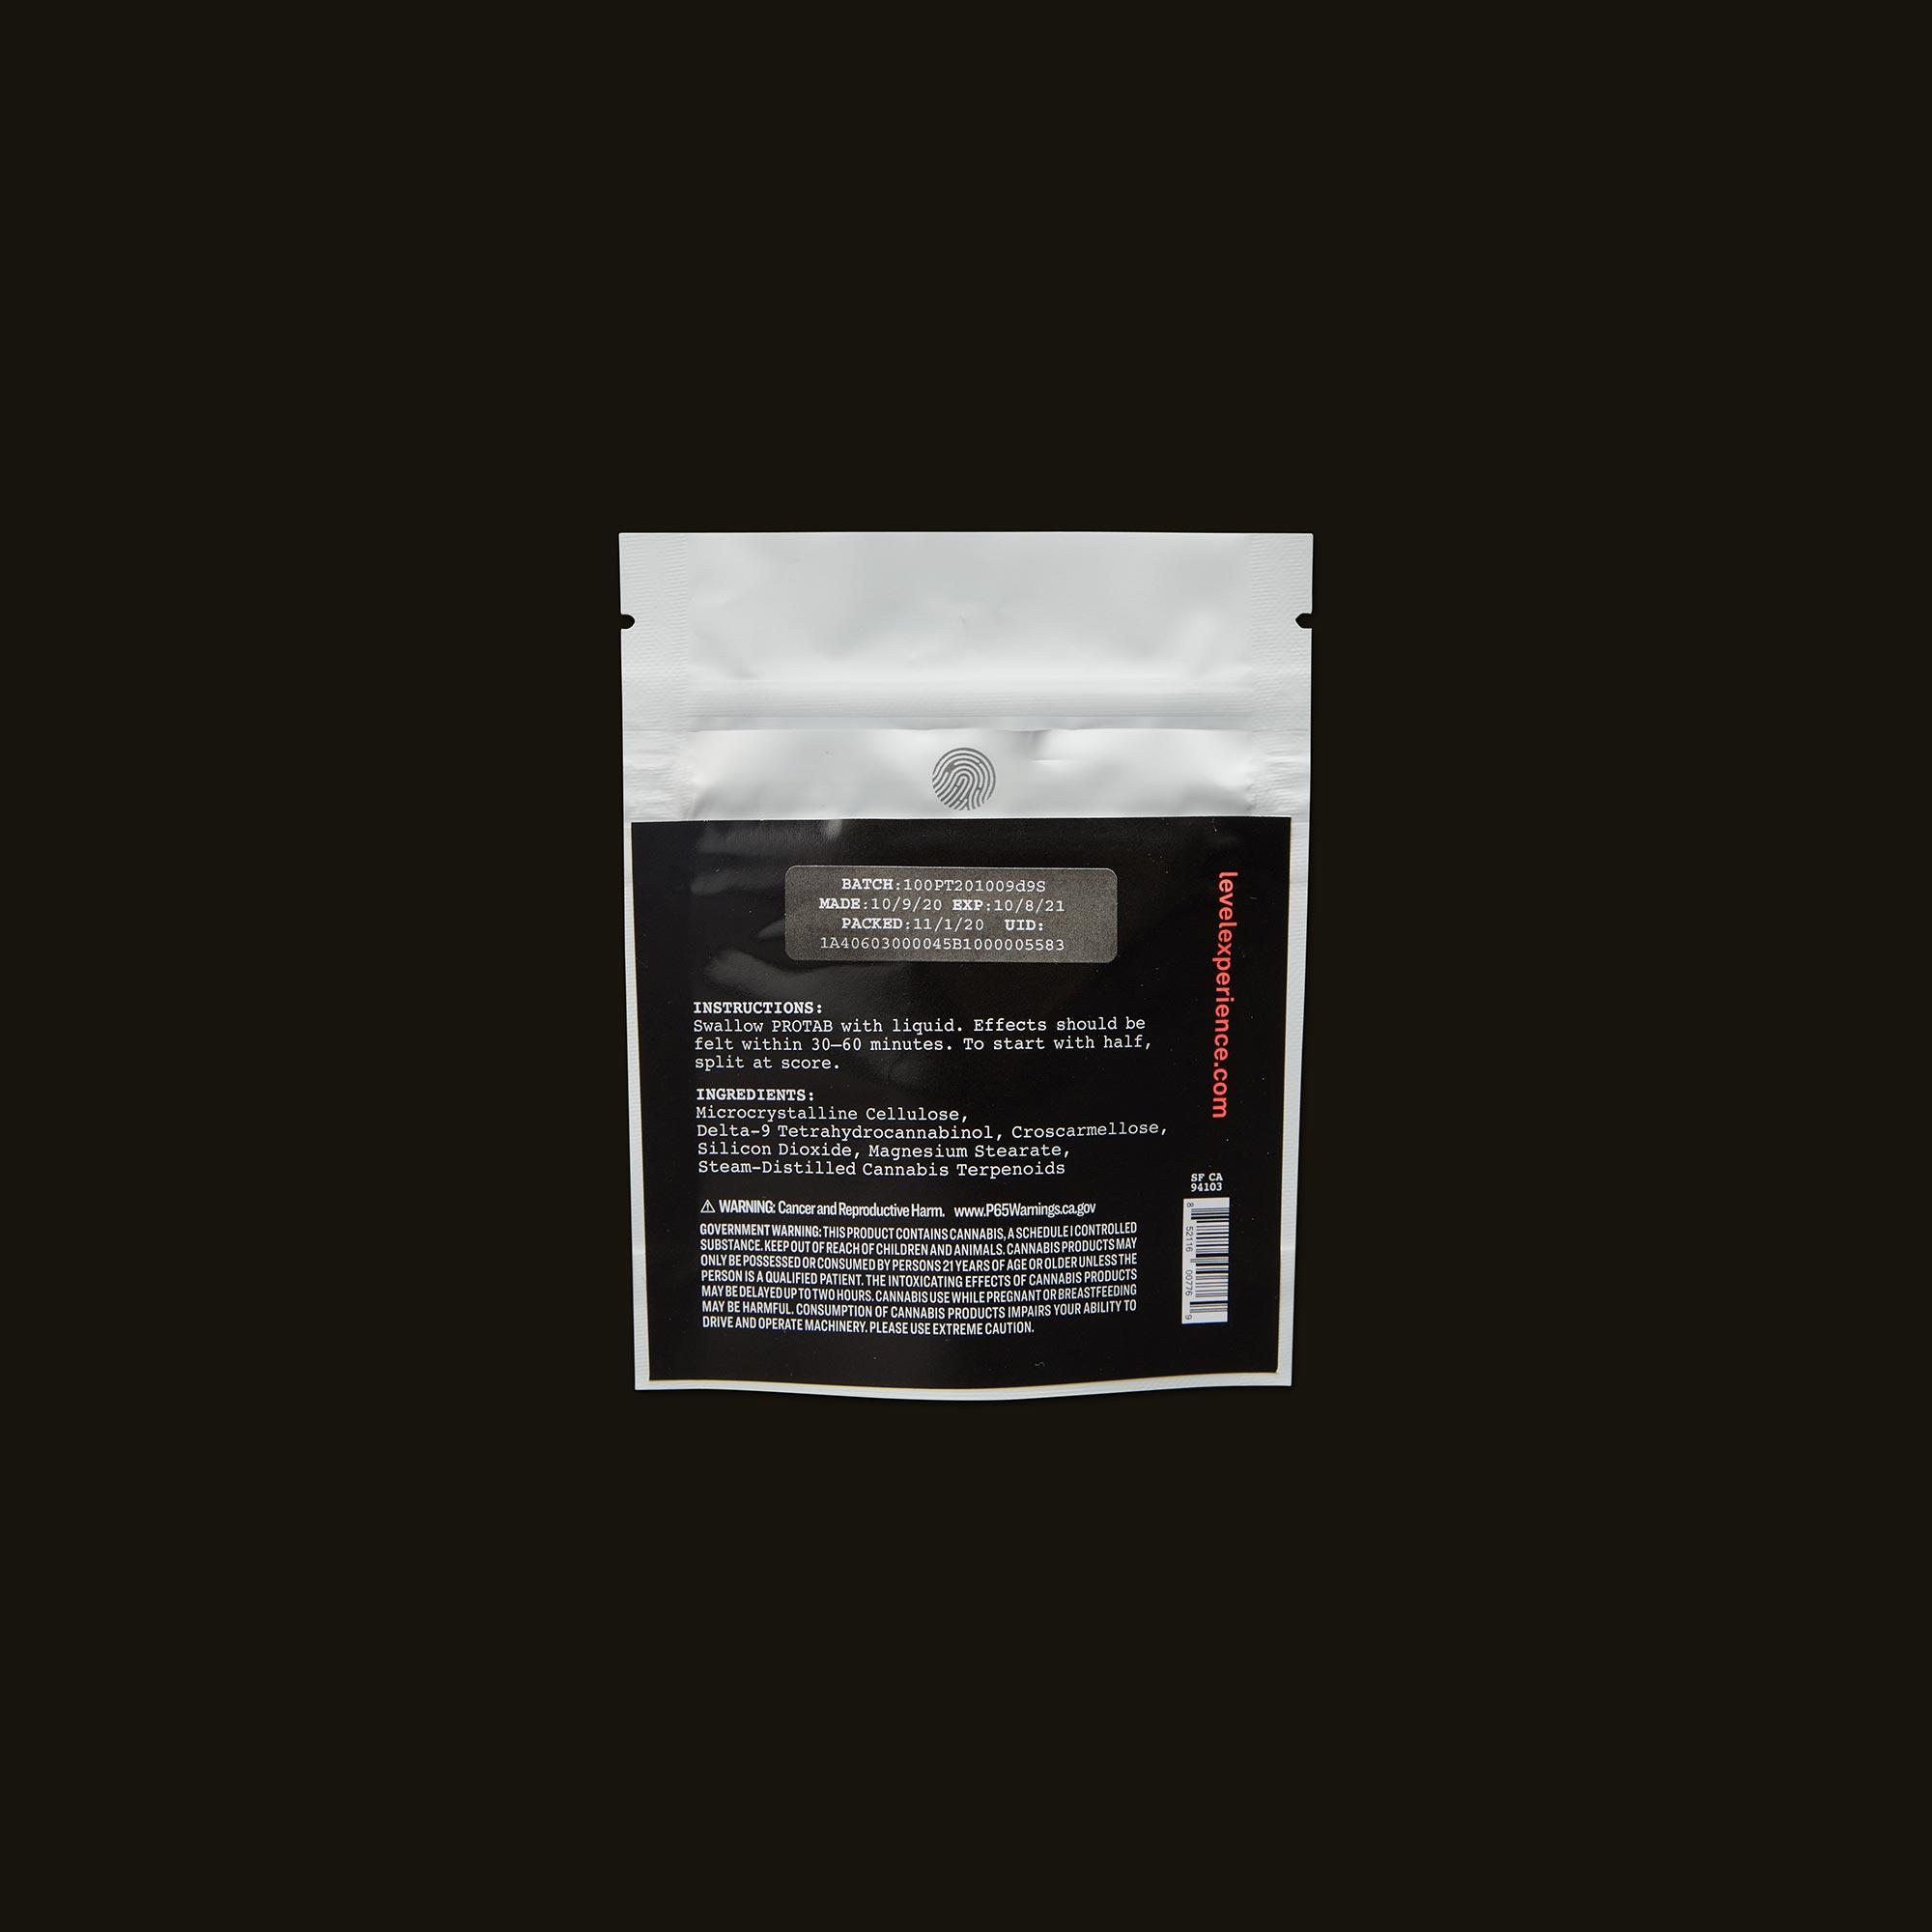 LEVEL Sativa Protab 100 Ingredients